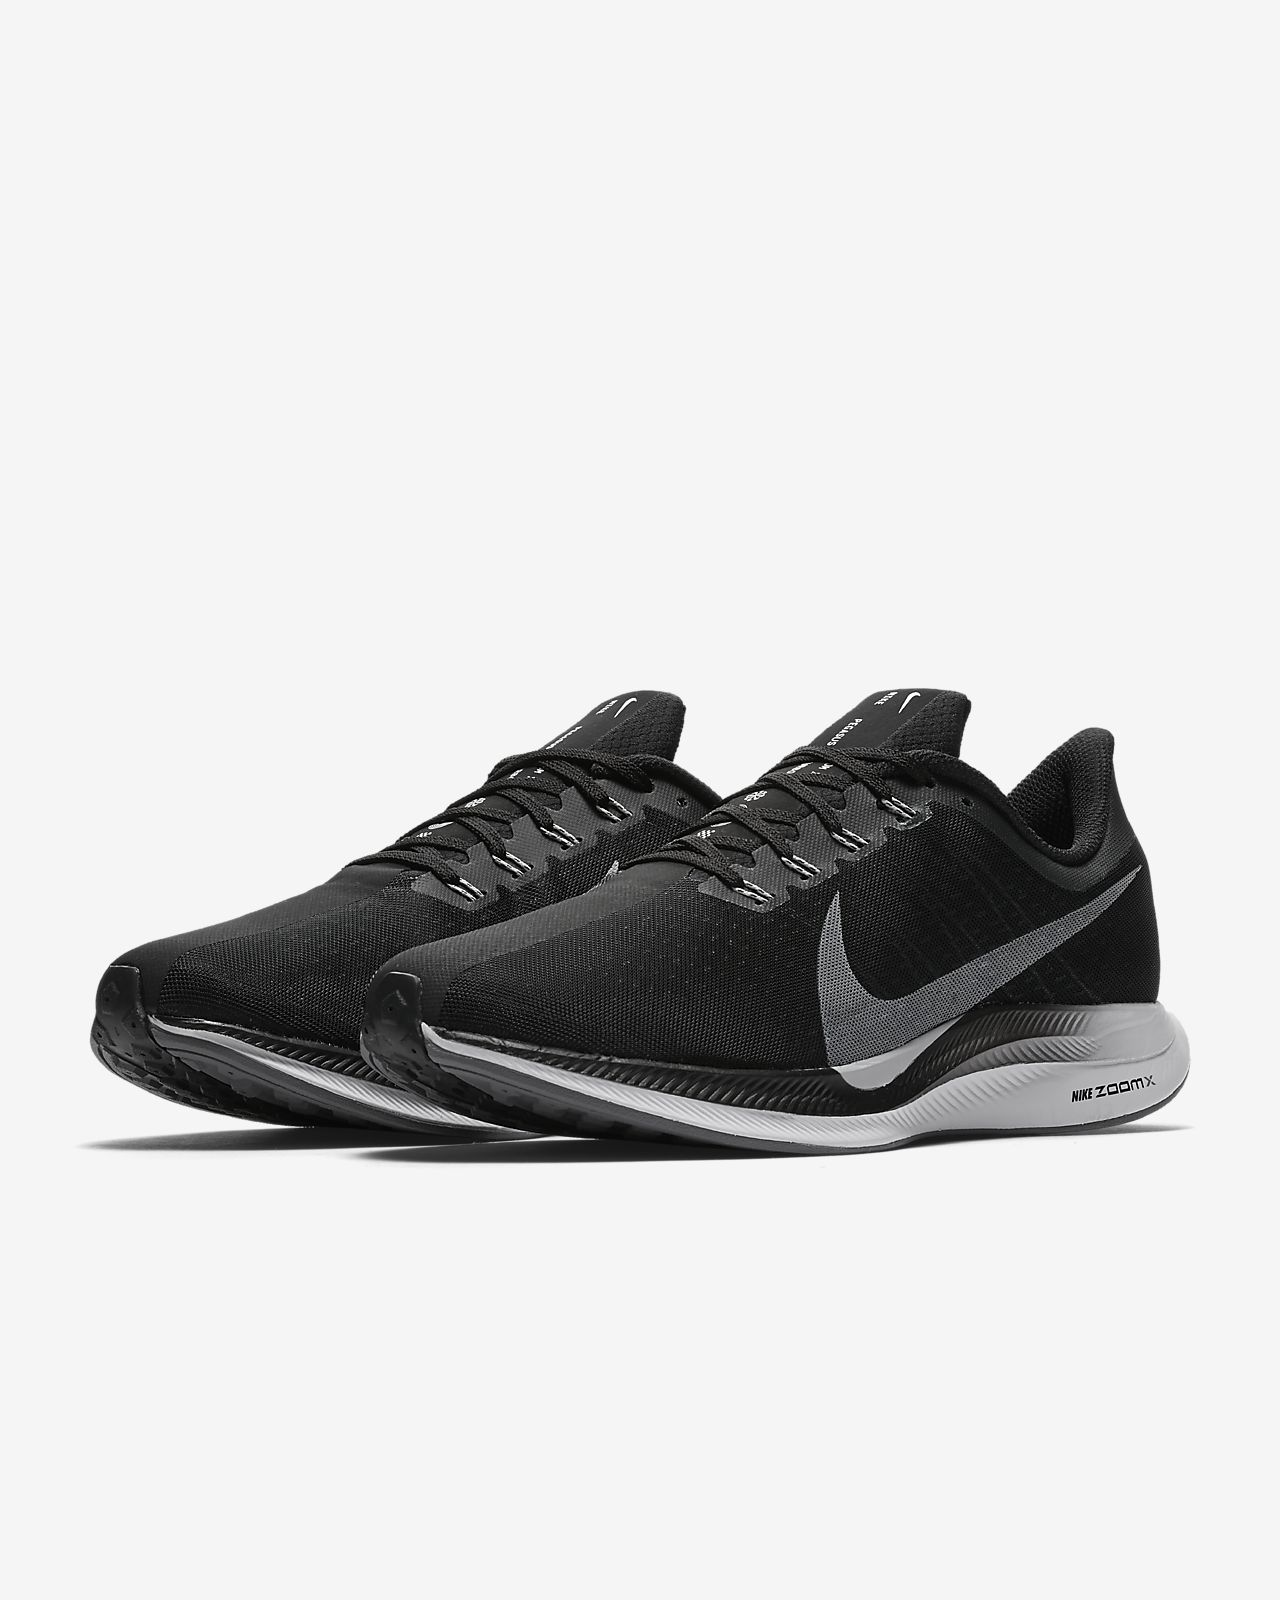 8398ecc1b Nike Zoom Pegasus Turbo Men s Running Shoe. Nike.com